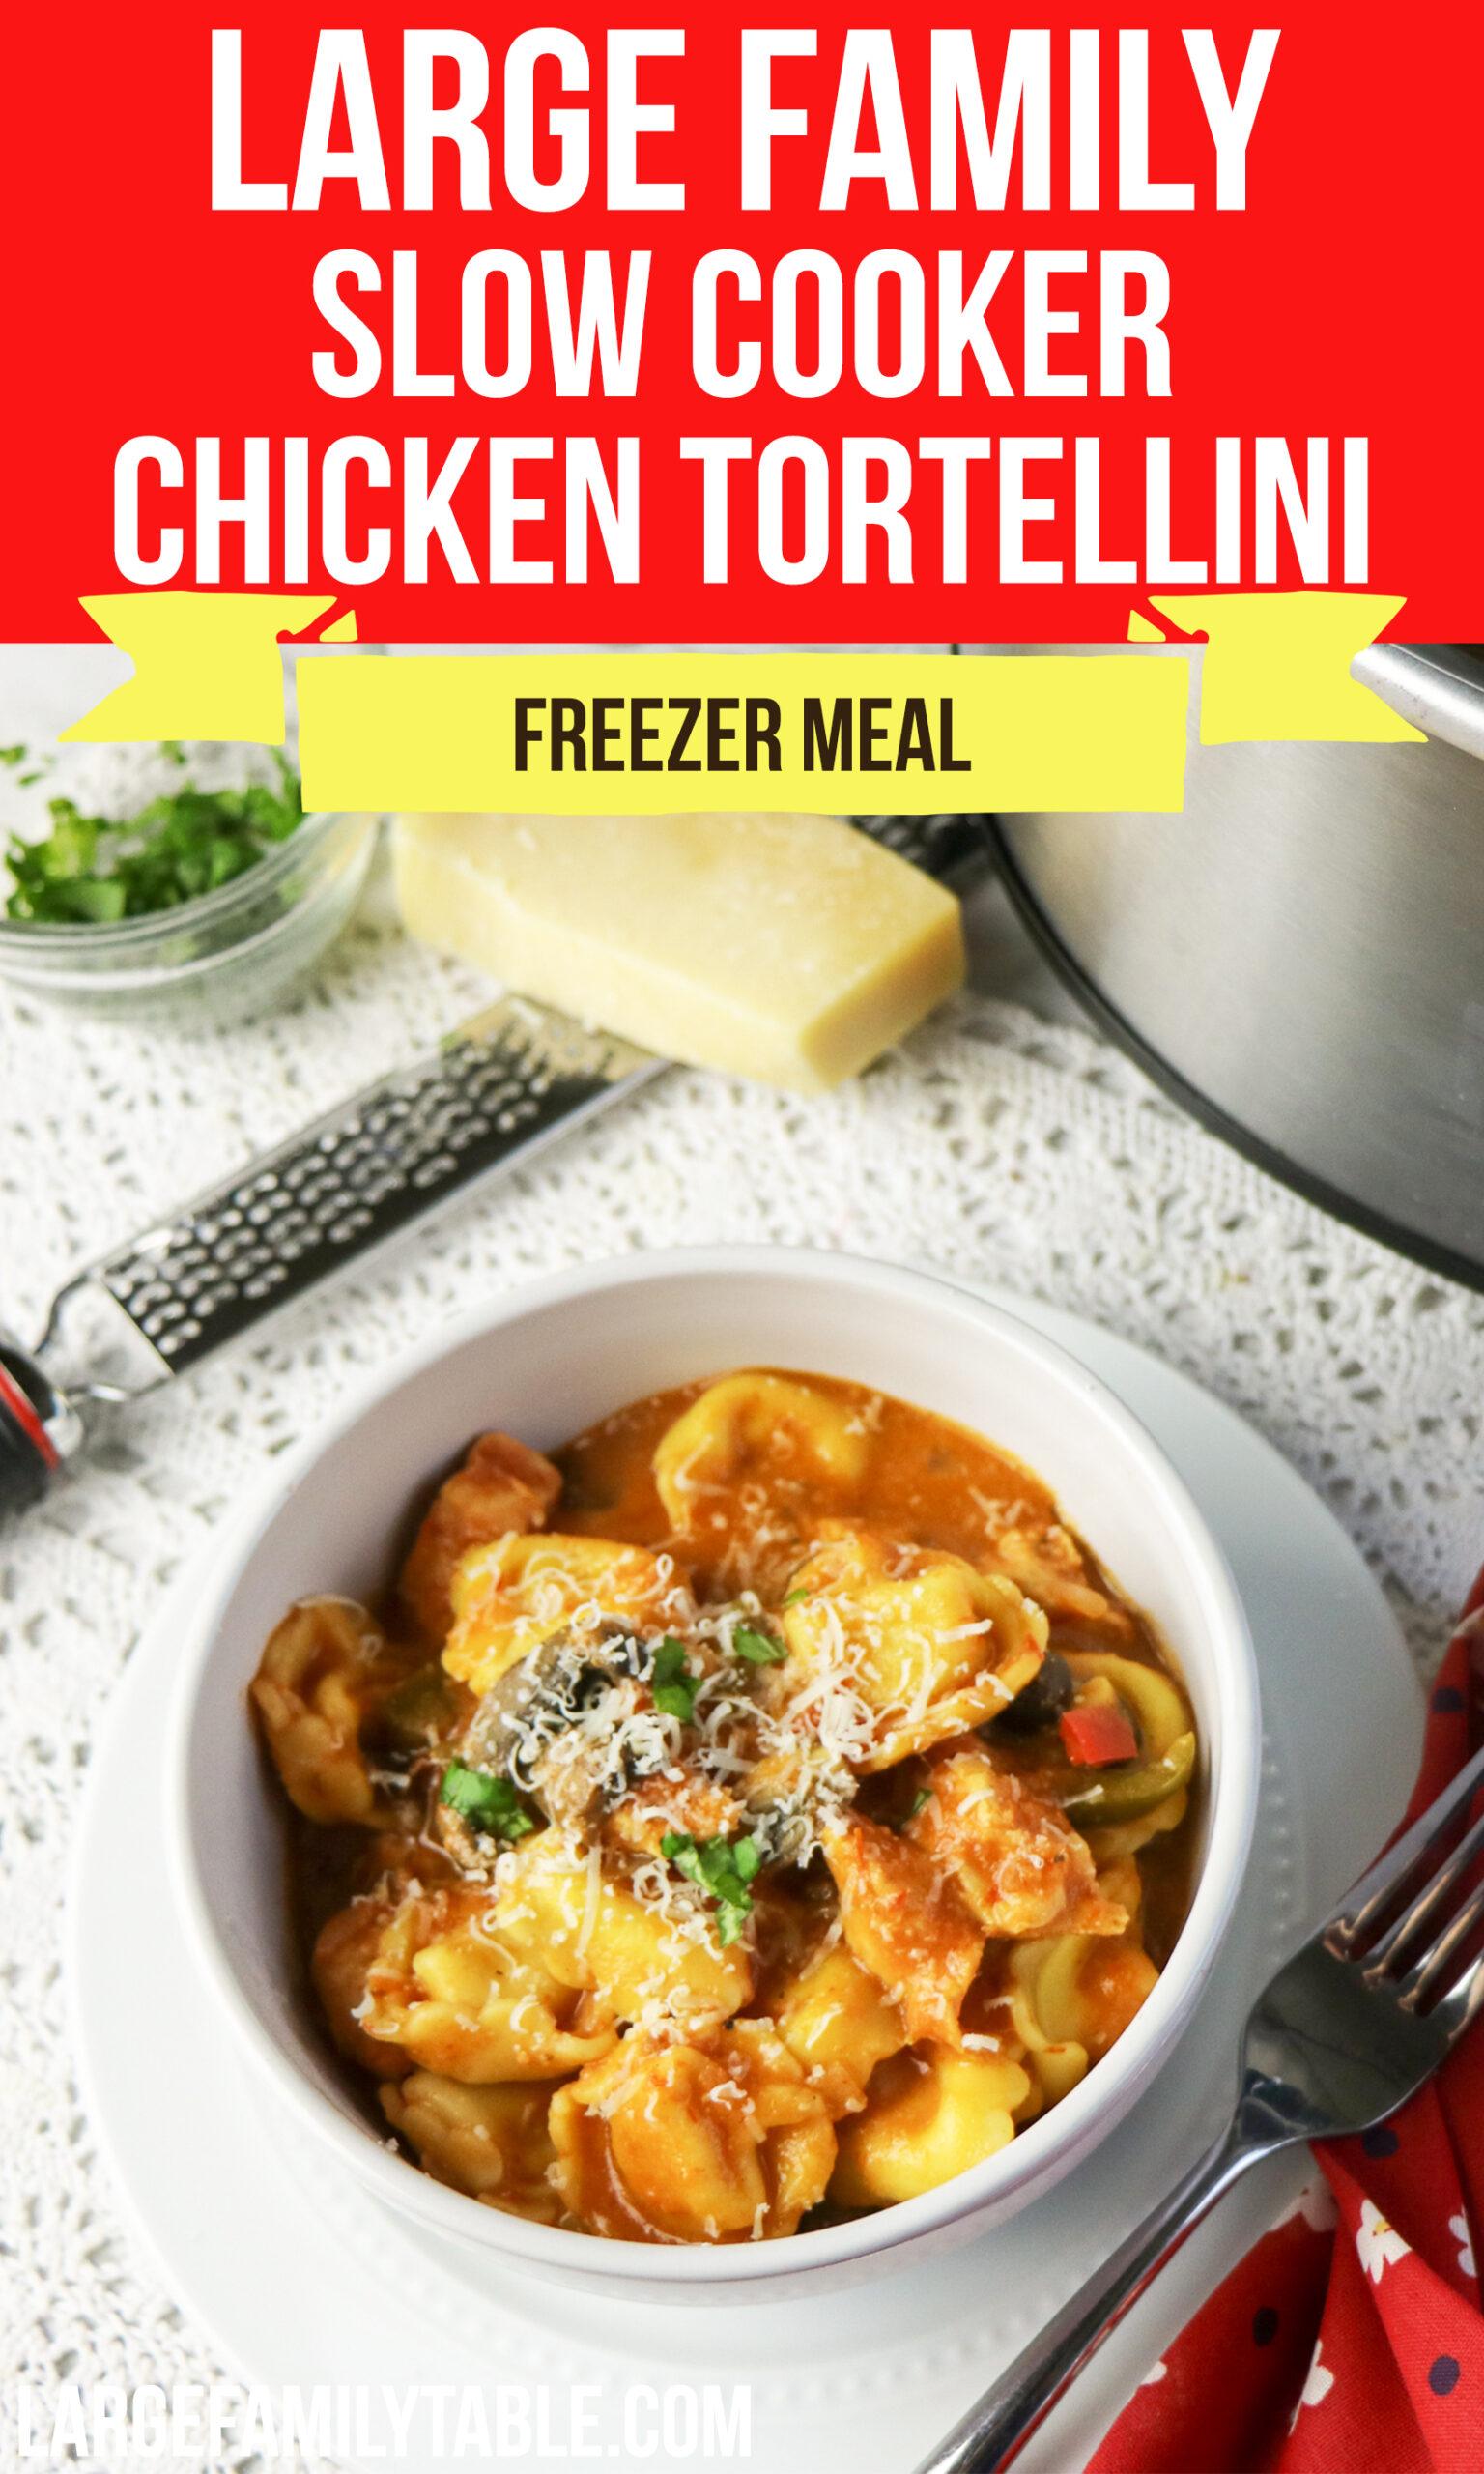 Slow Cooker Chicken Tortellini